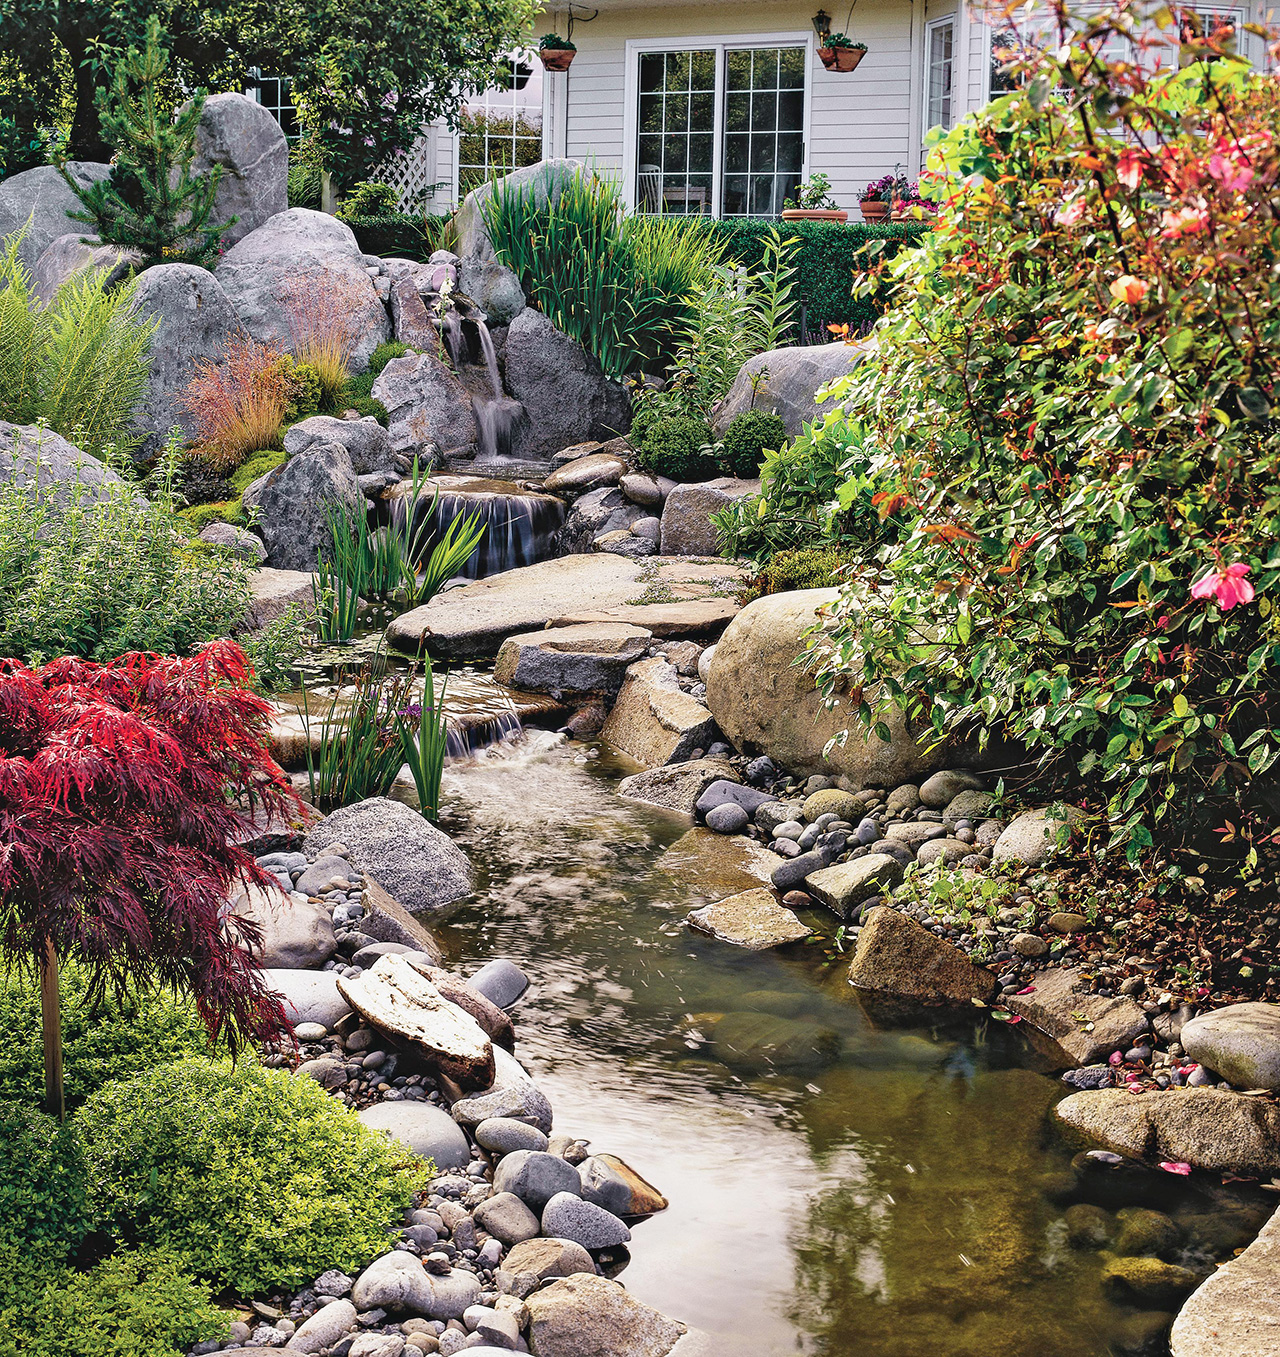 Backyard Landscaping Ideas   Better Homes & Gardens on Backyard Stream Ideas id=42787